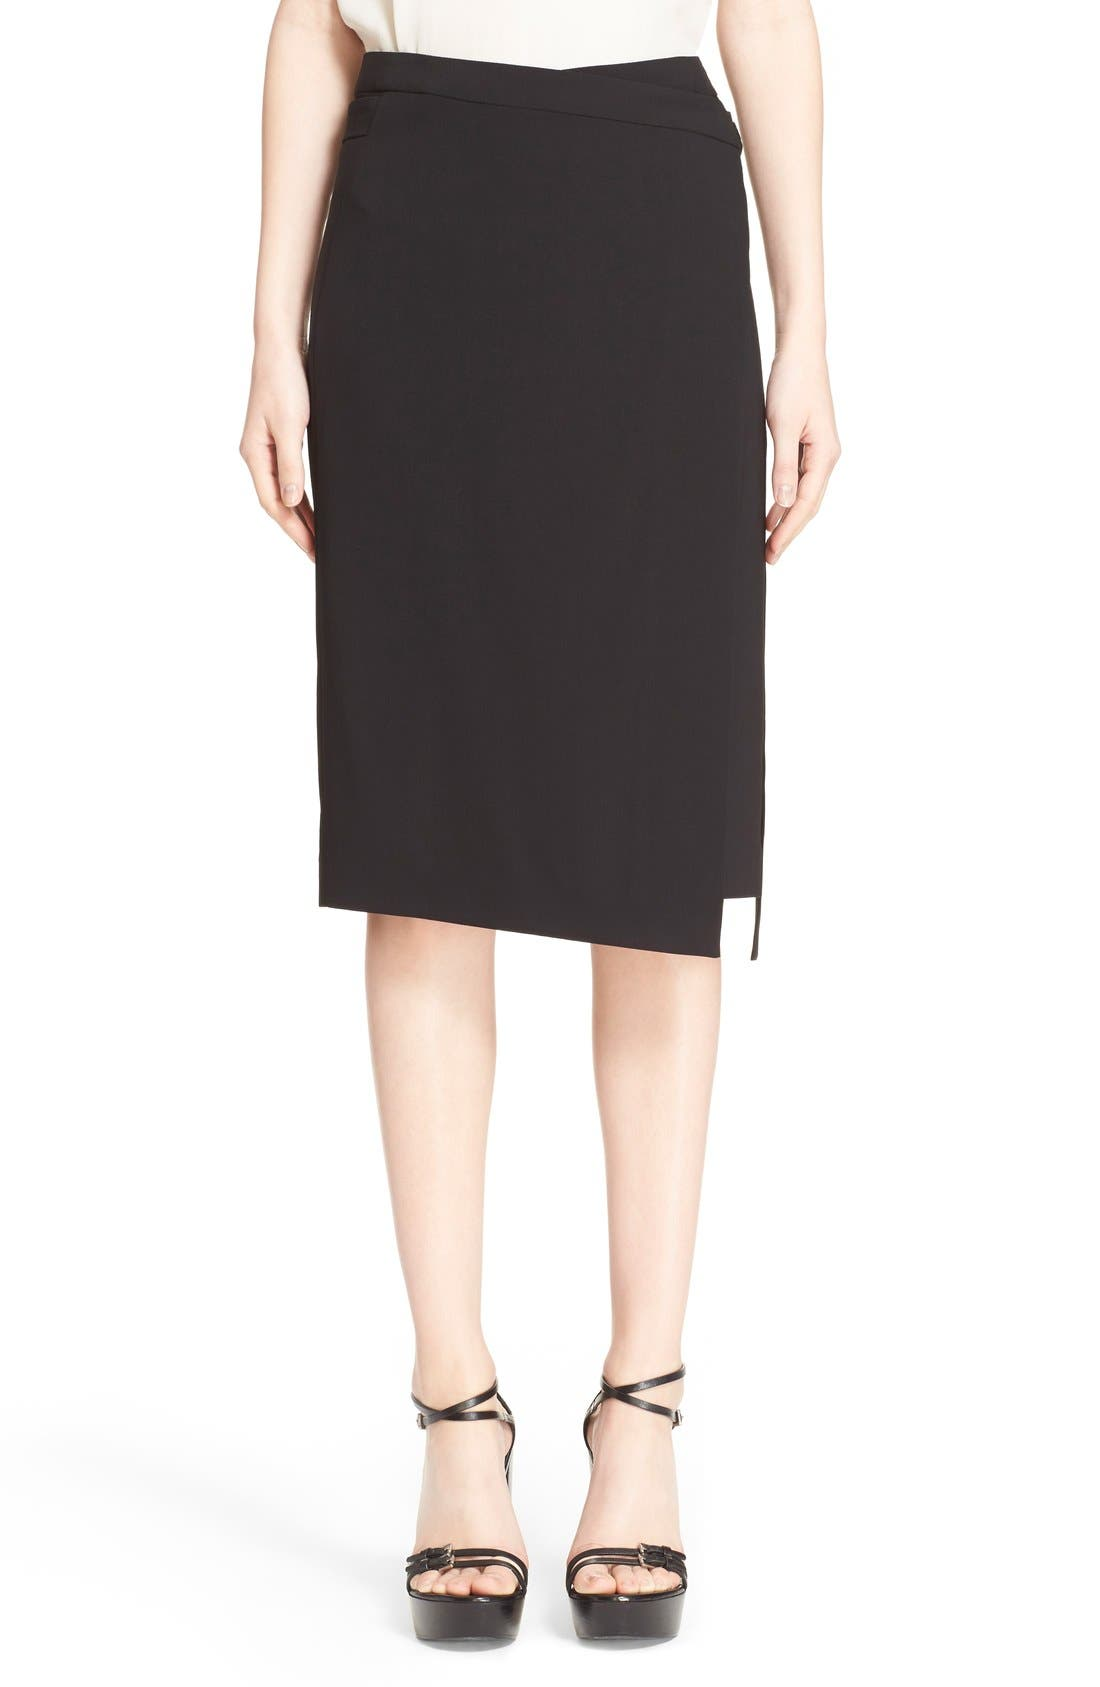 Alternate Image 1 Selected - Michael Kors Belted Wool Wrap Skirt